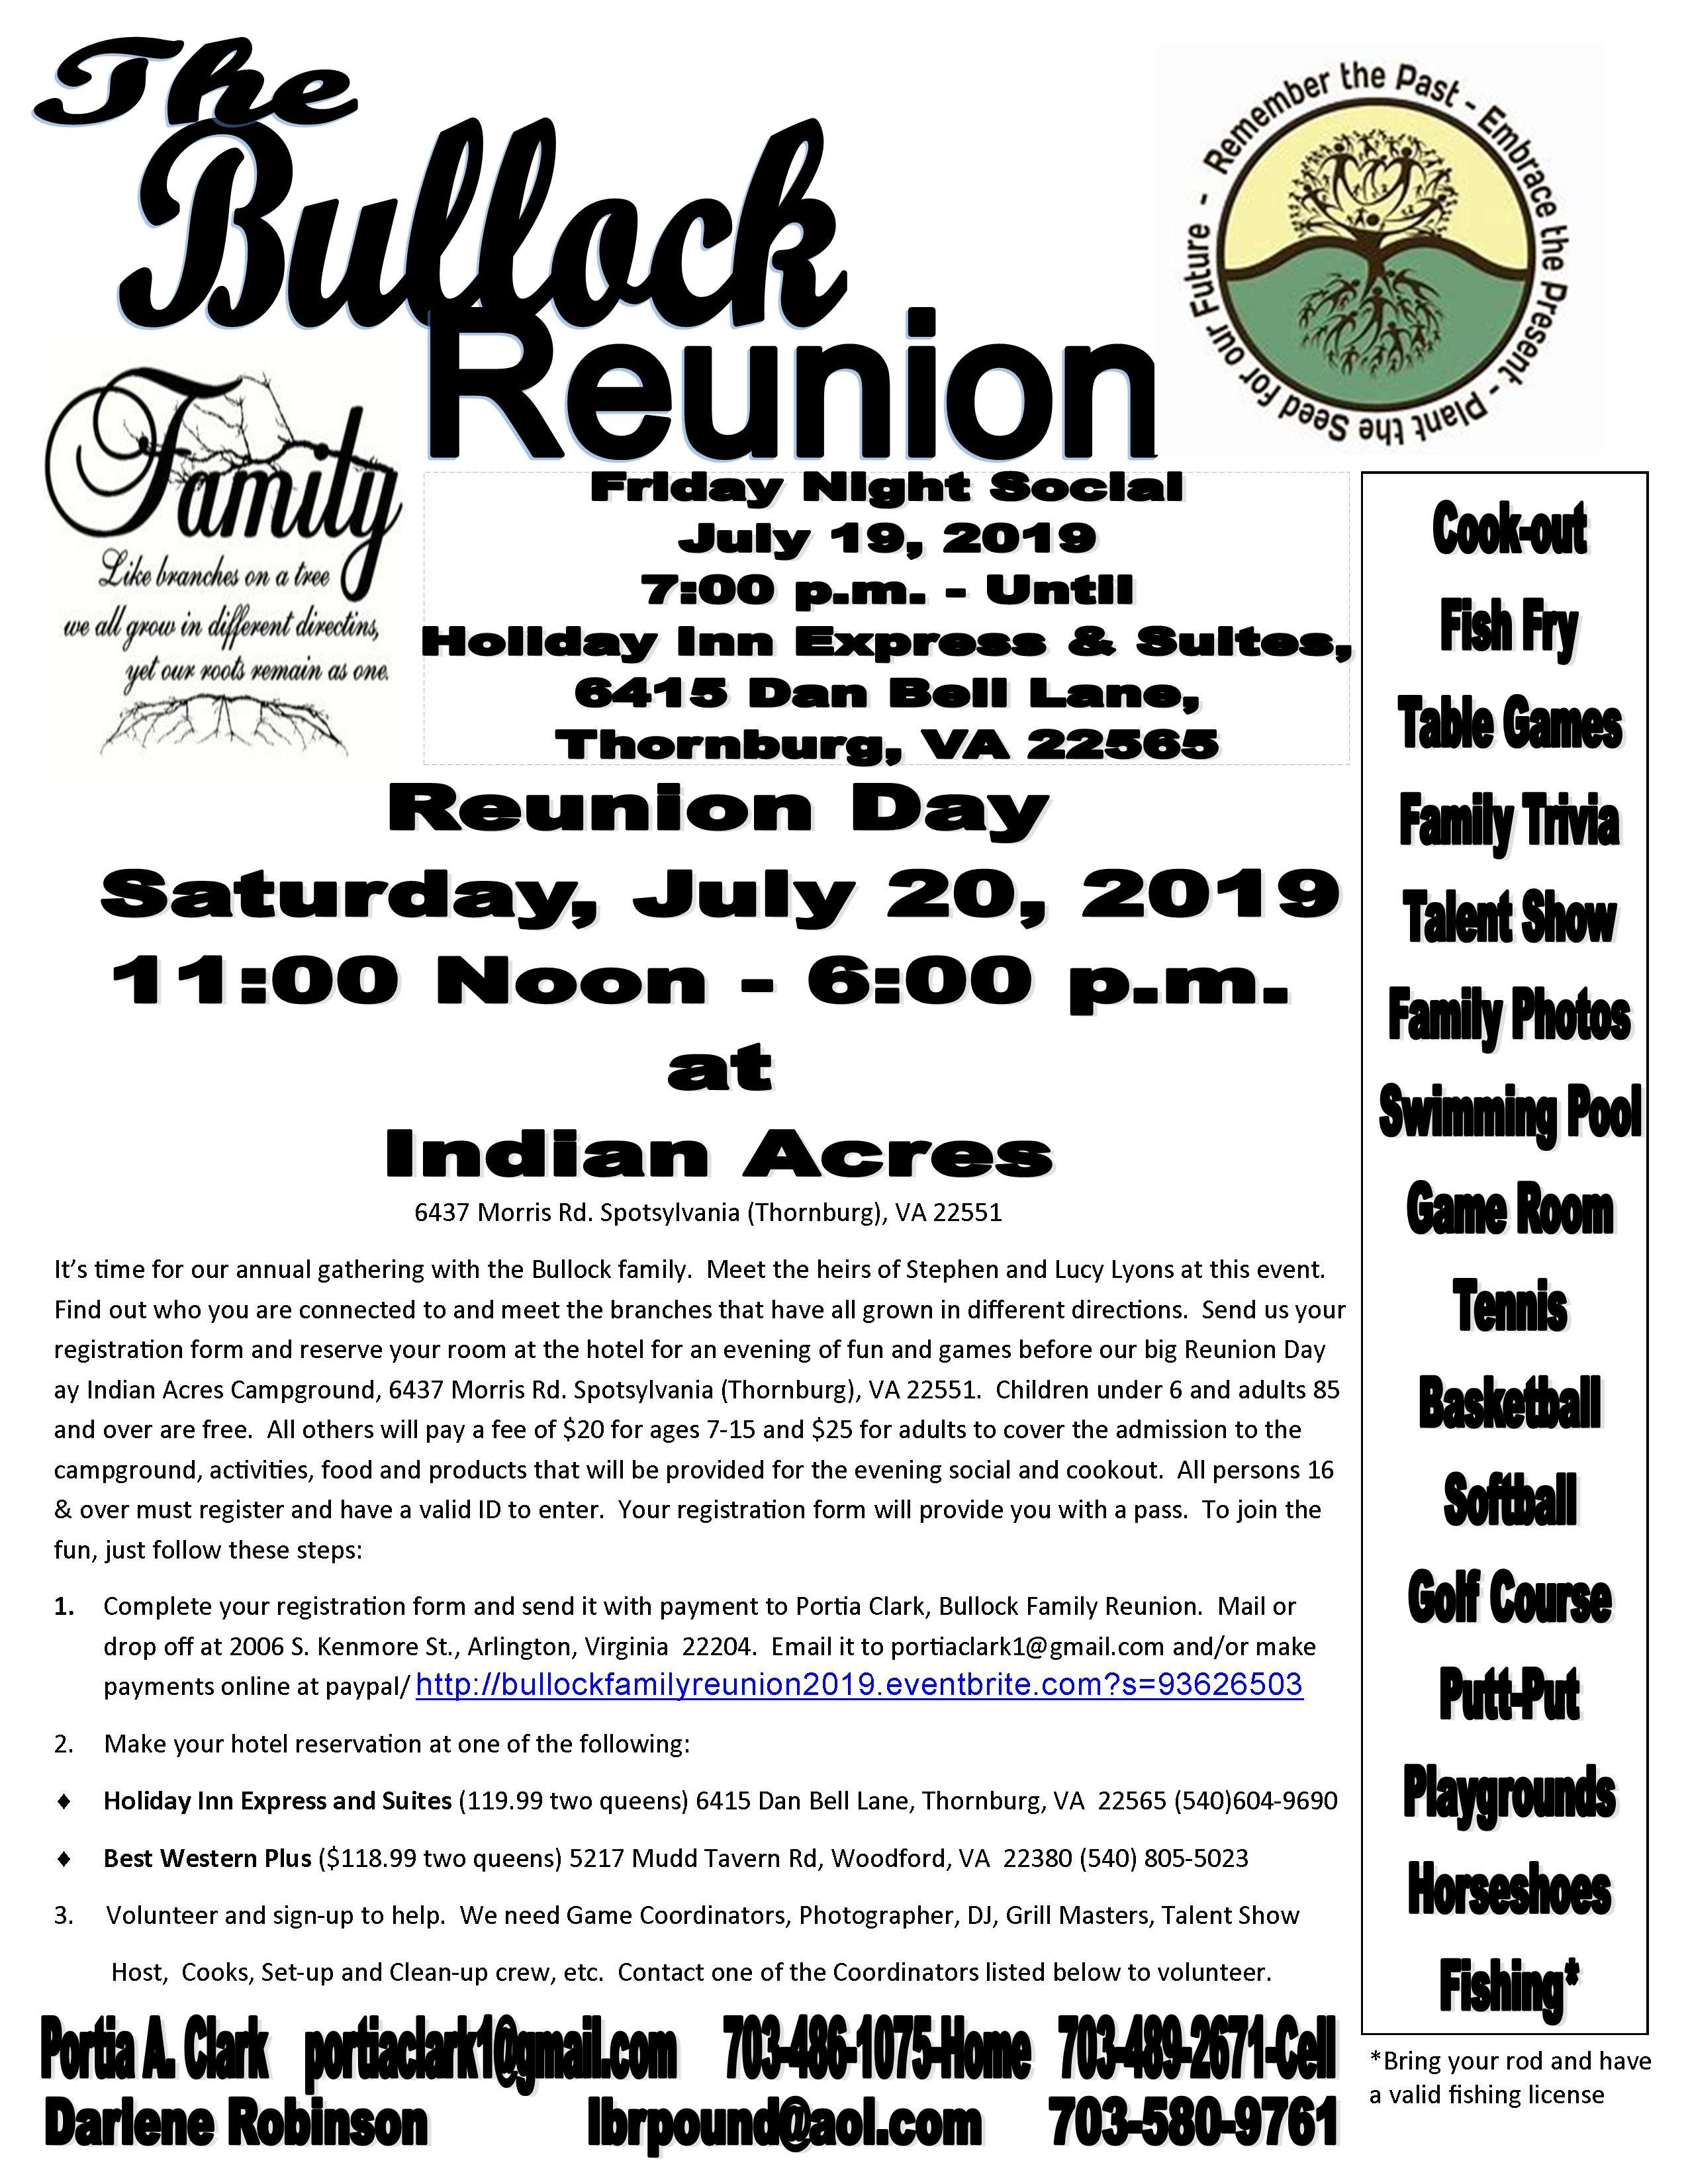 Bullock Family Reunion 2019 Flyer